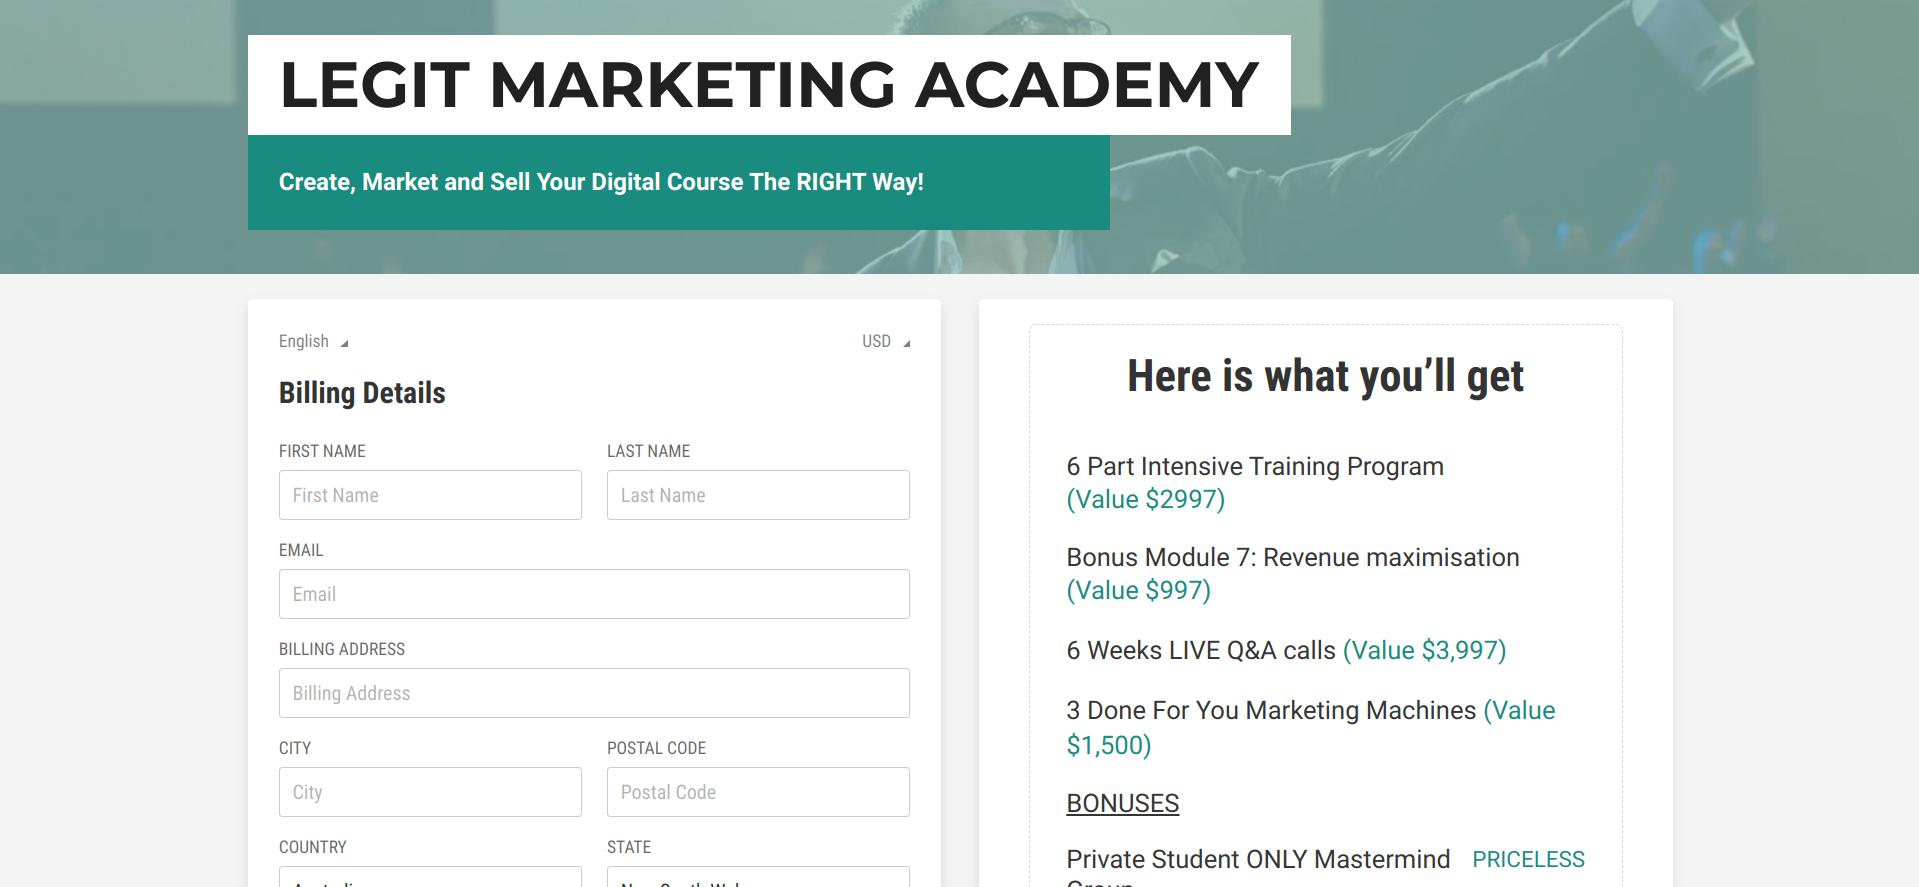 Is Jon Penberthy's Legit Marketing Academy a Scam or Legit